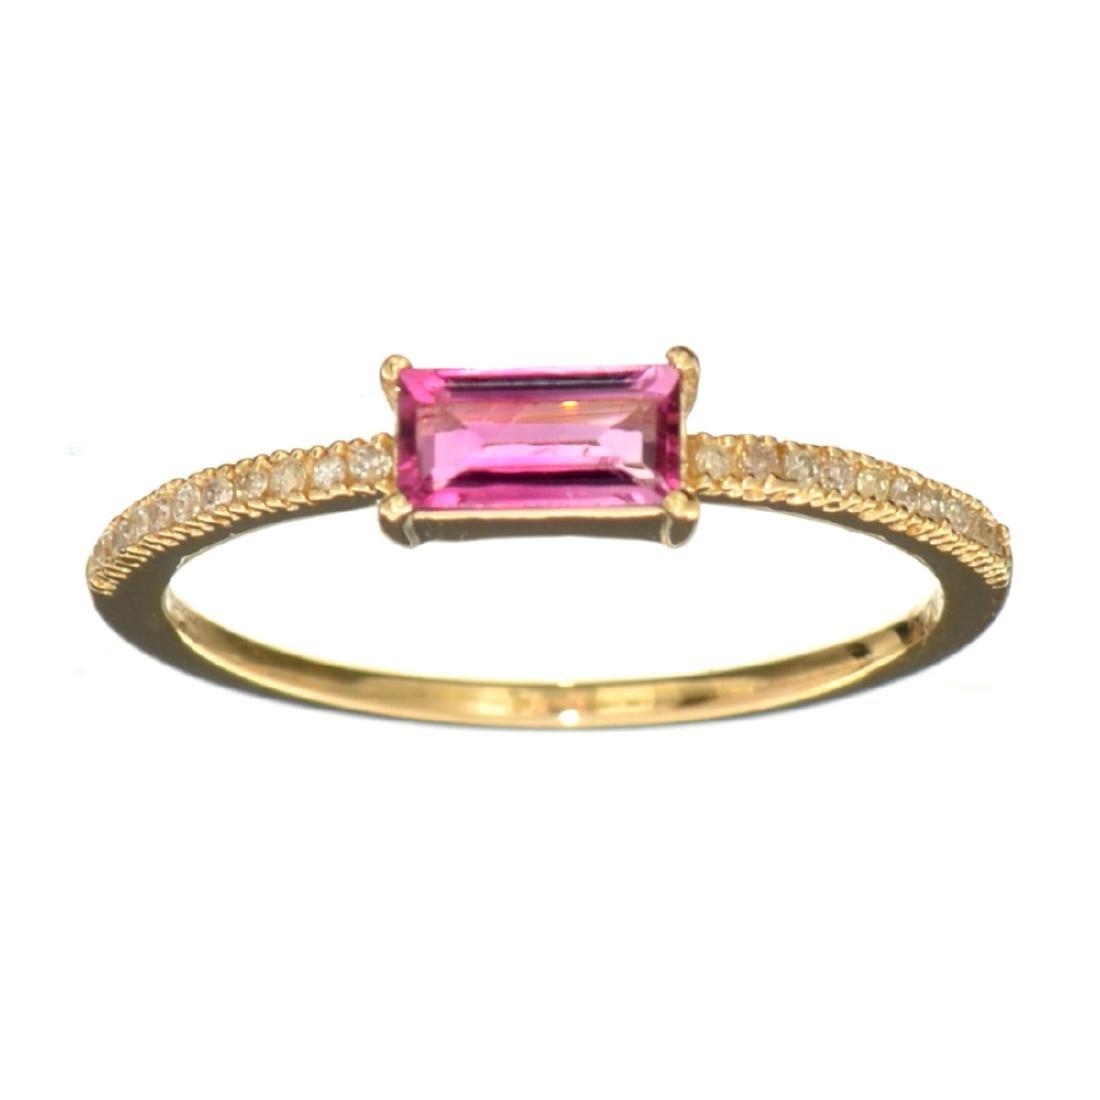 14KT Gold 0.42CT Rectangular Cut Pink Tourmaline and